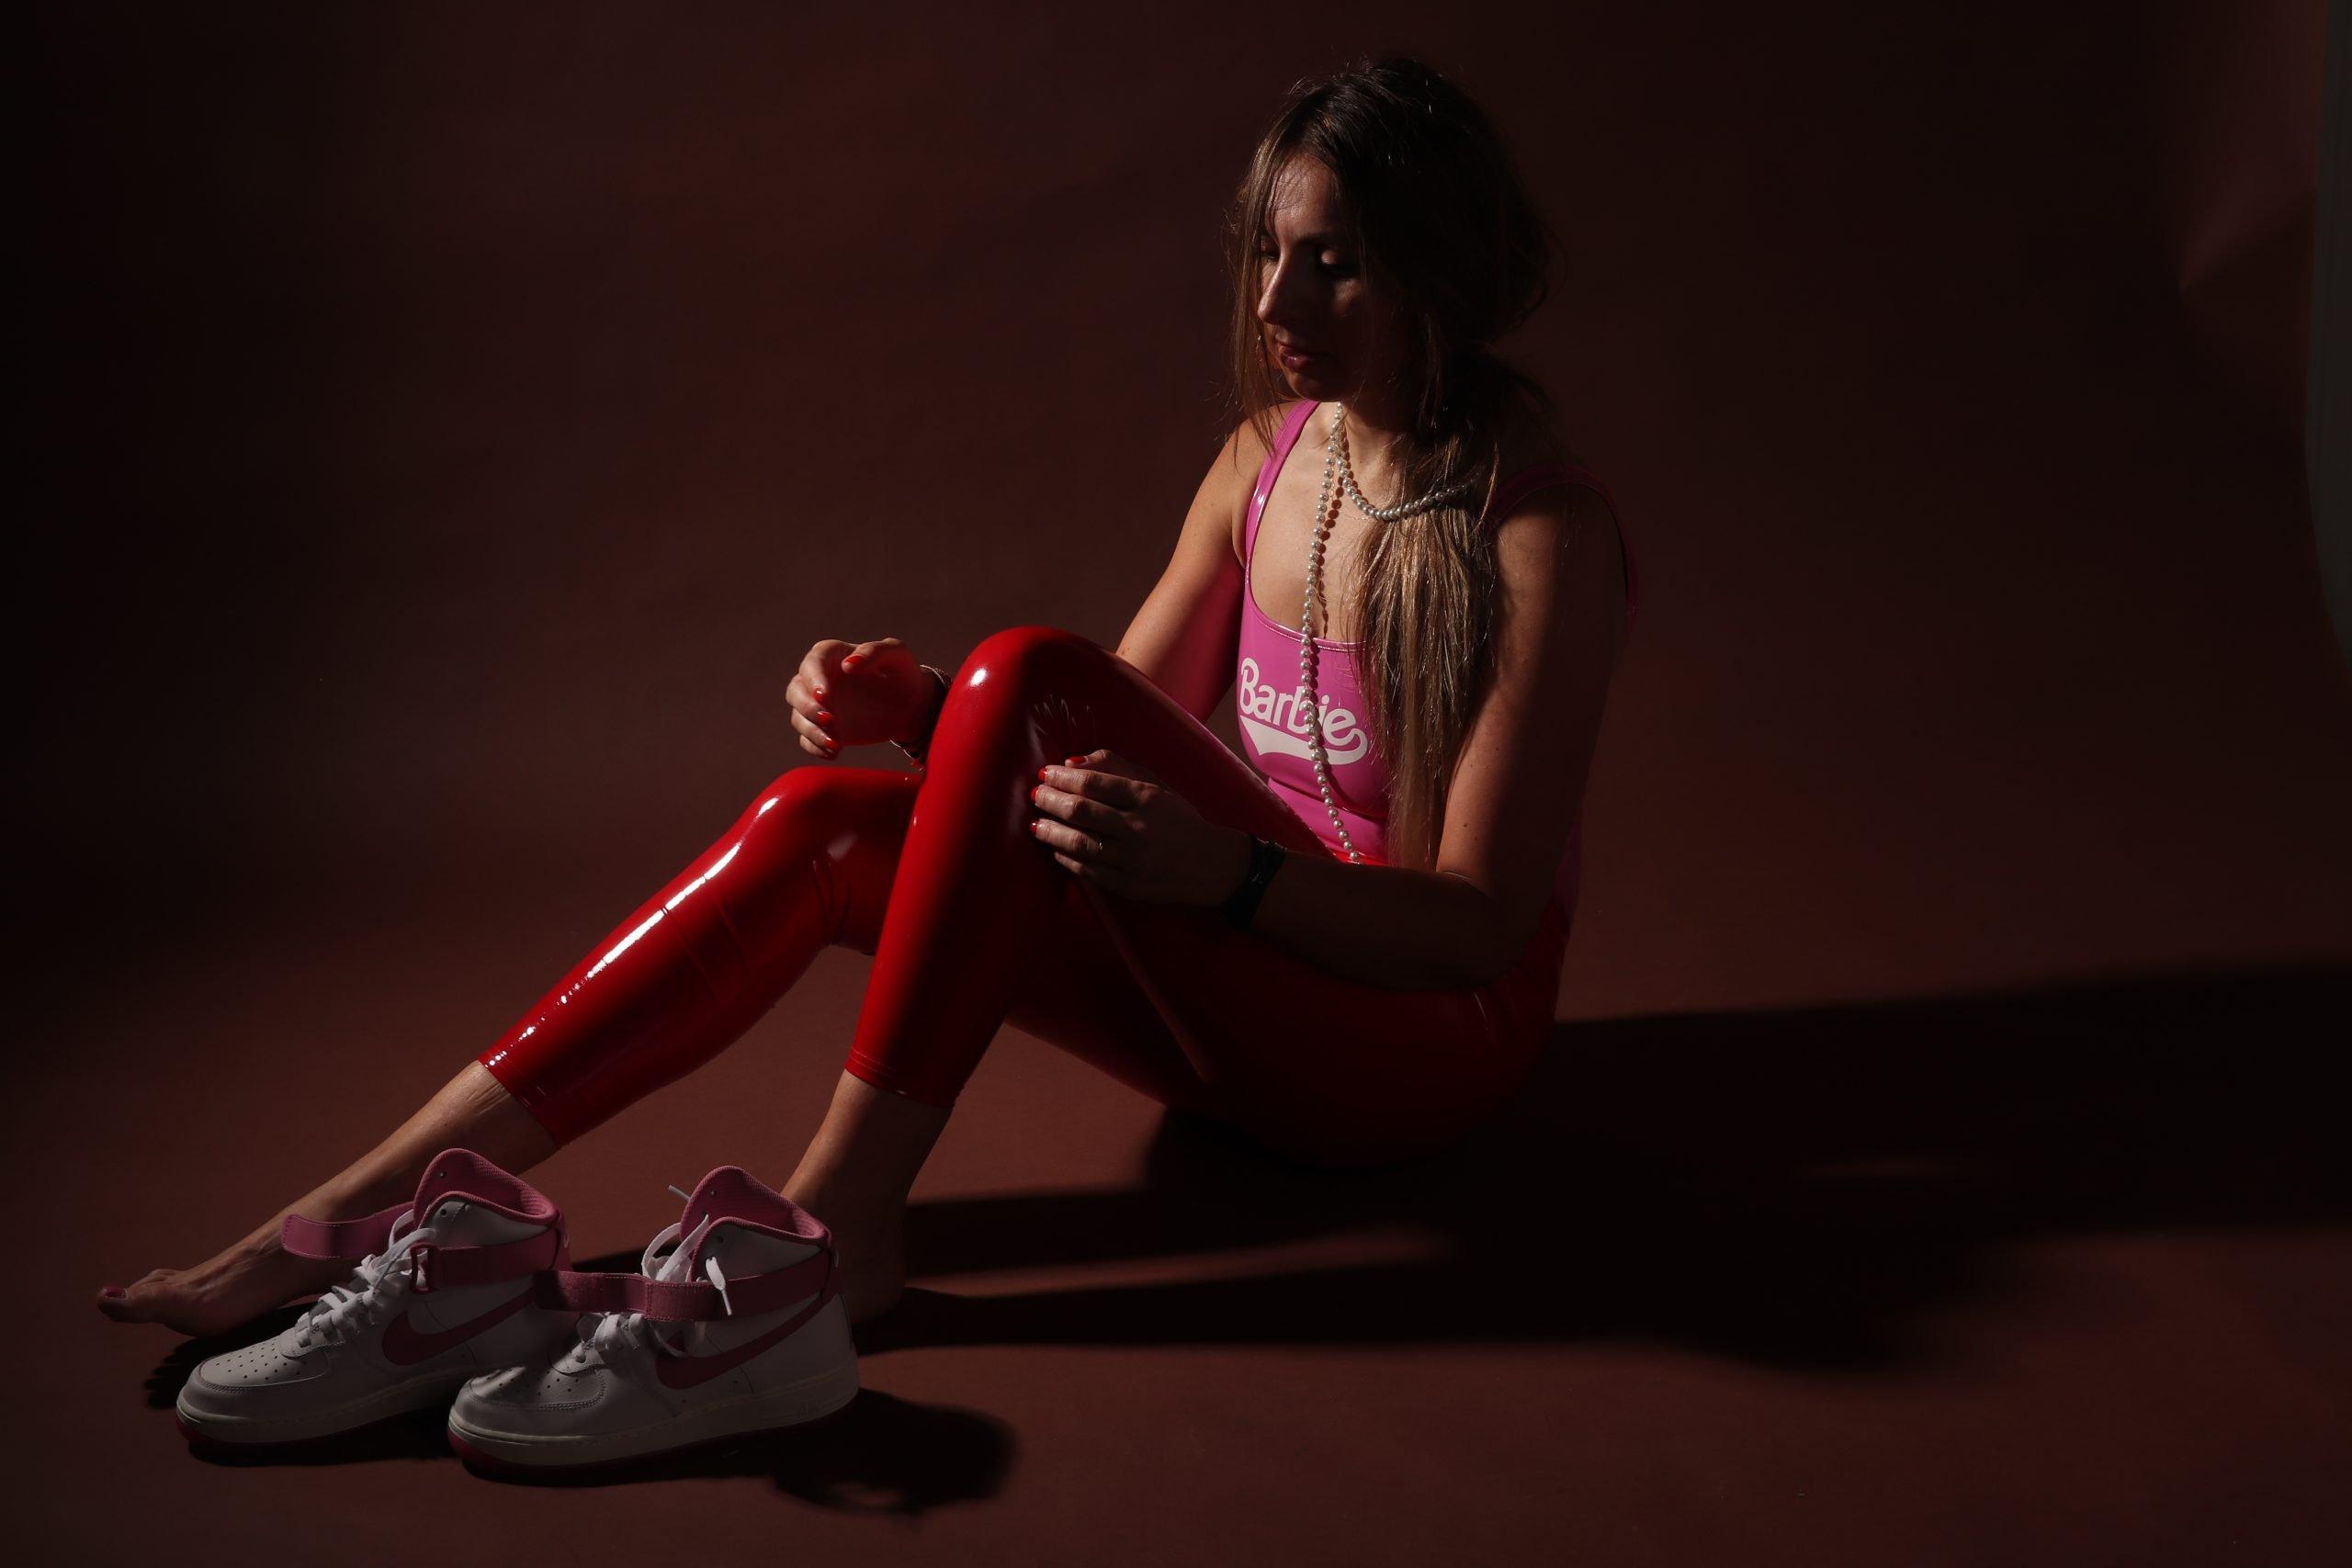 patent leggings laklegging rood barbie lak nike custom wit roze